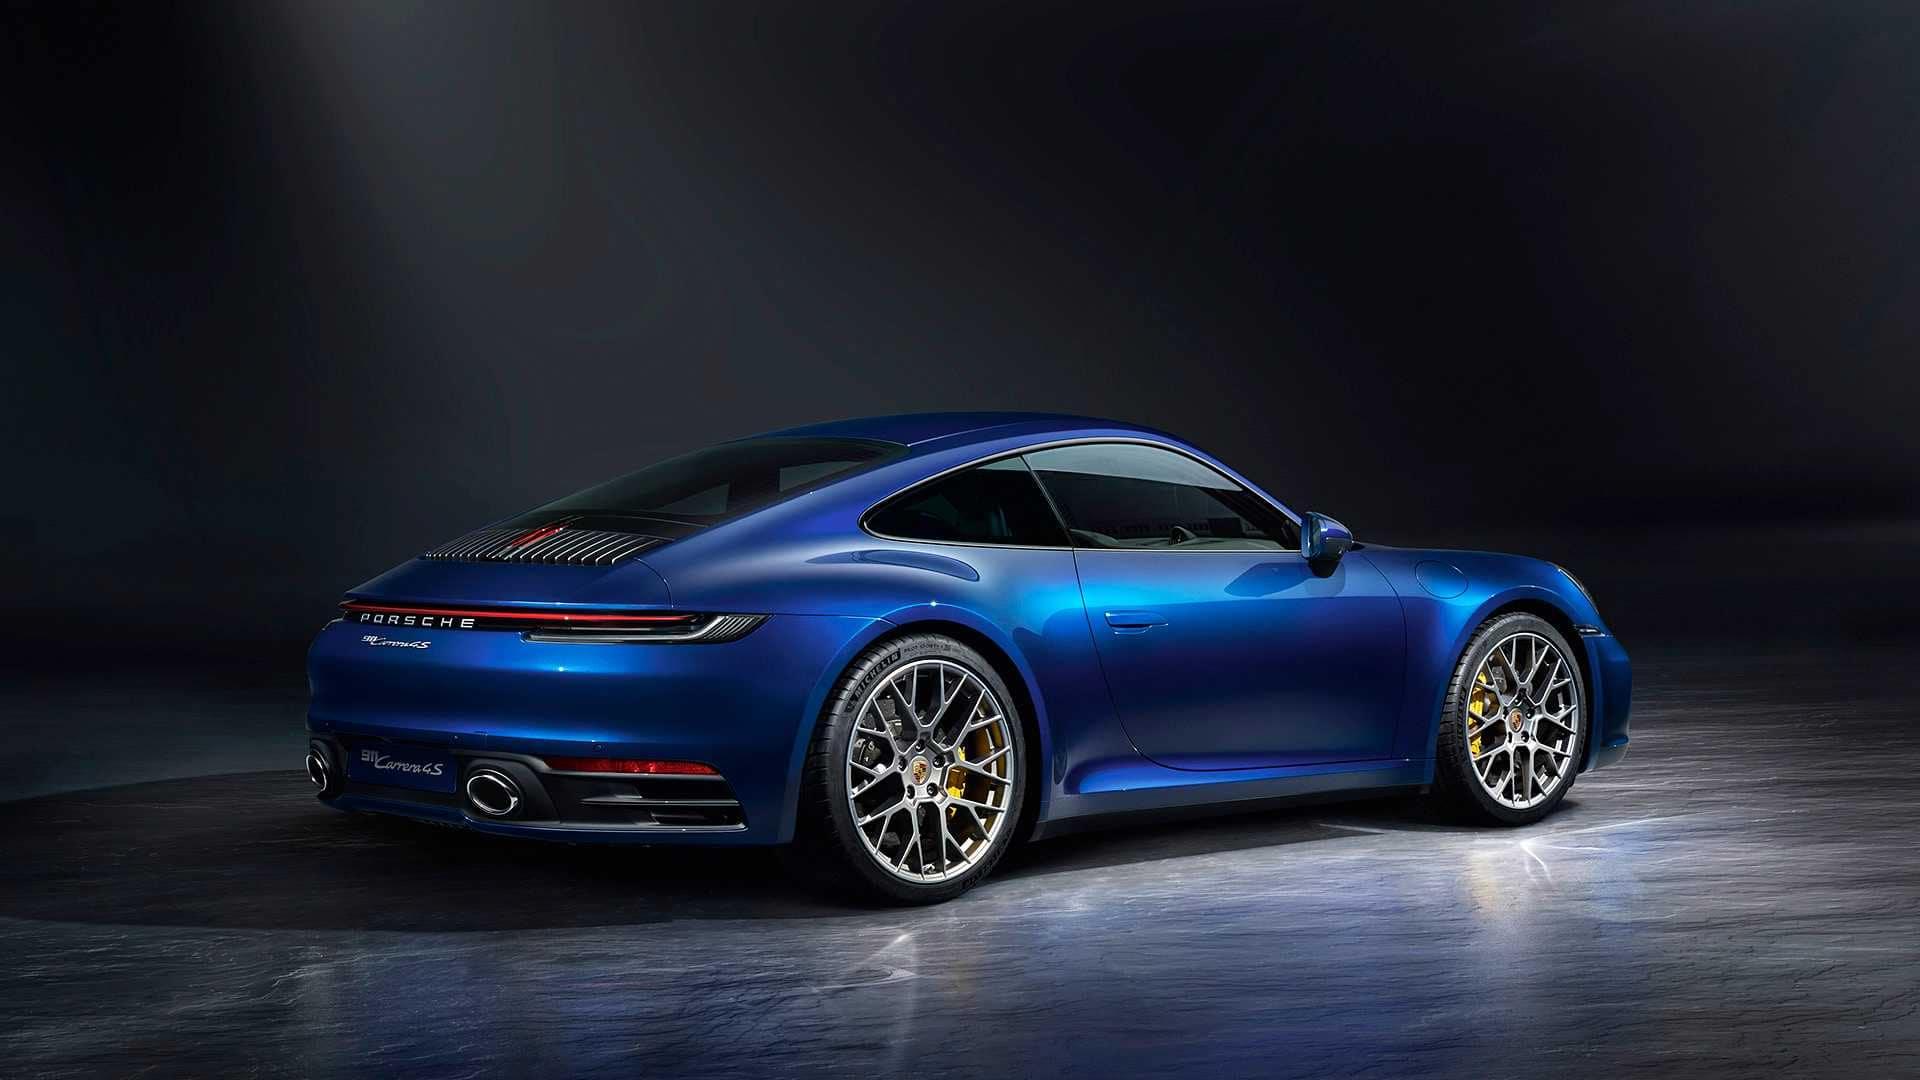 2019 911 Carrera Blue Exterior Back View